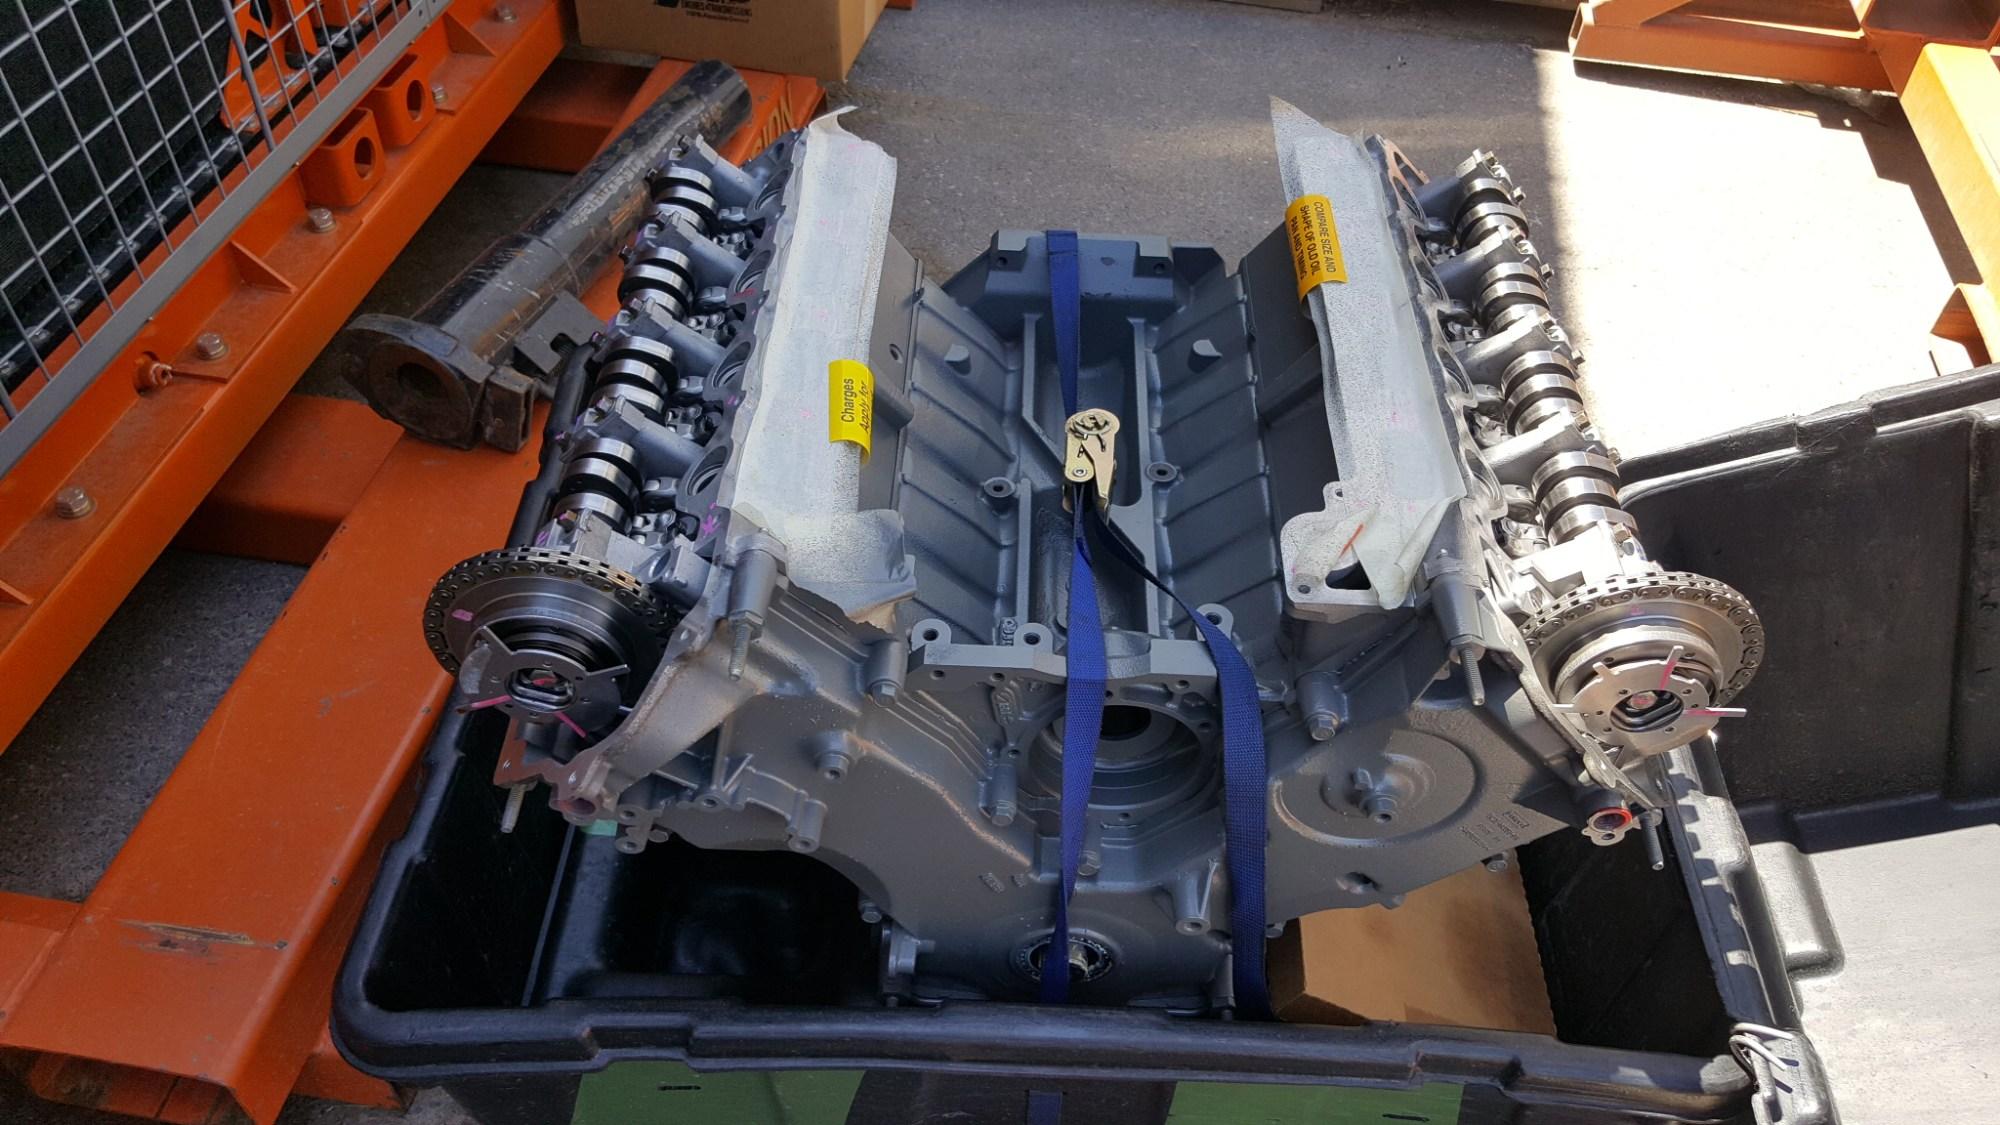 hight resolution of rebuilt remanufactured 5 4 liter sohc v8 ford mod engine external parts plastic intake manifold exhaust manifolds water pump intake runner motor